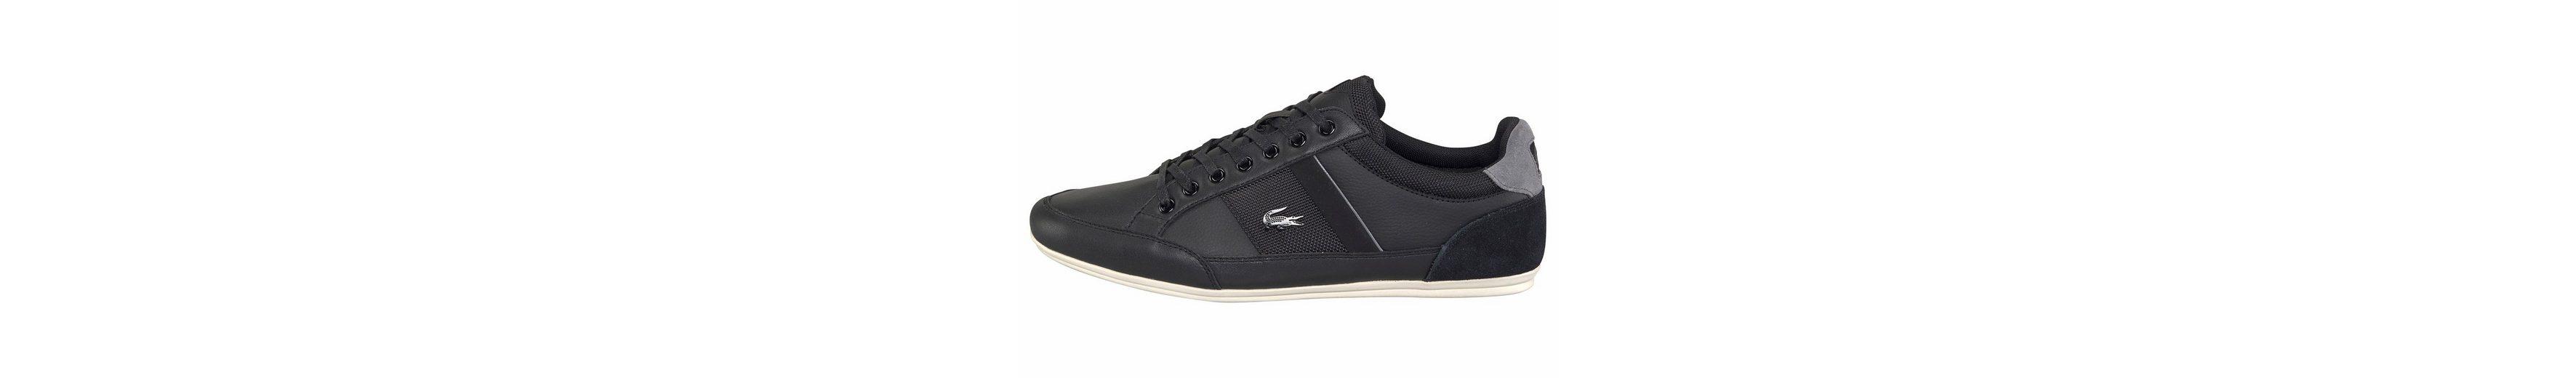 CAM Lacoste Sneaker 116 Lacoste Chaymon Chaymon 1 U7cFwyBFpq